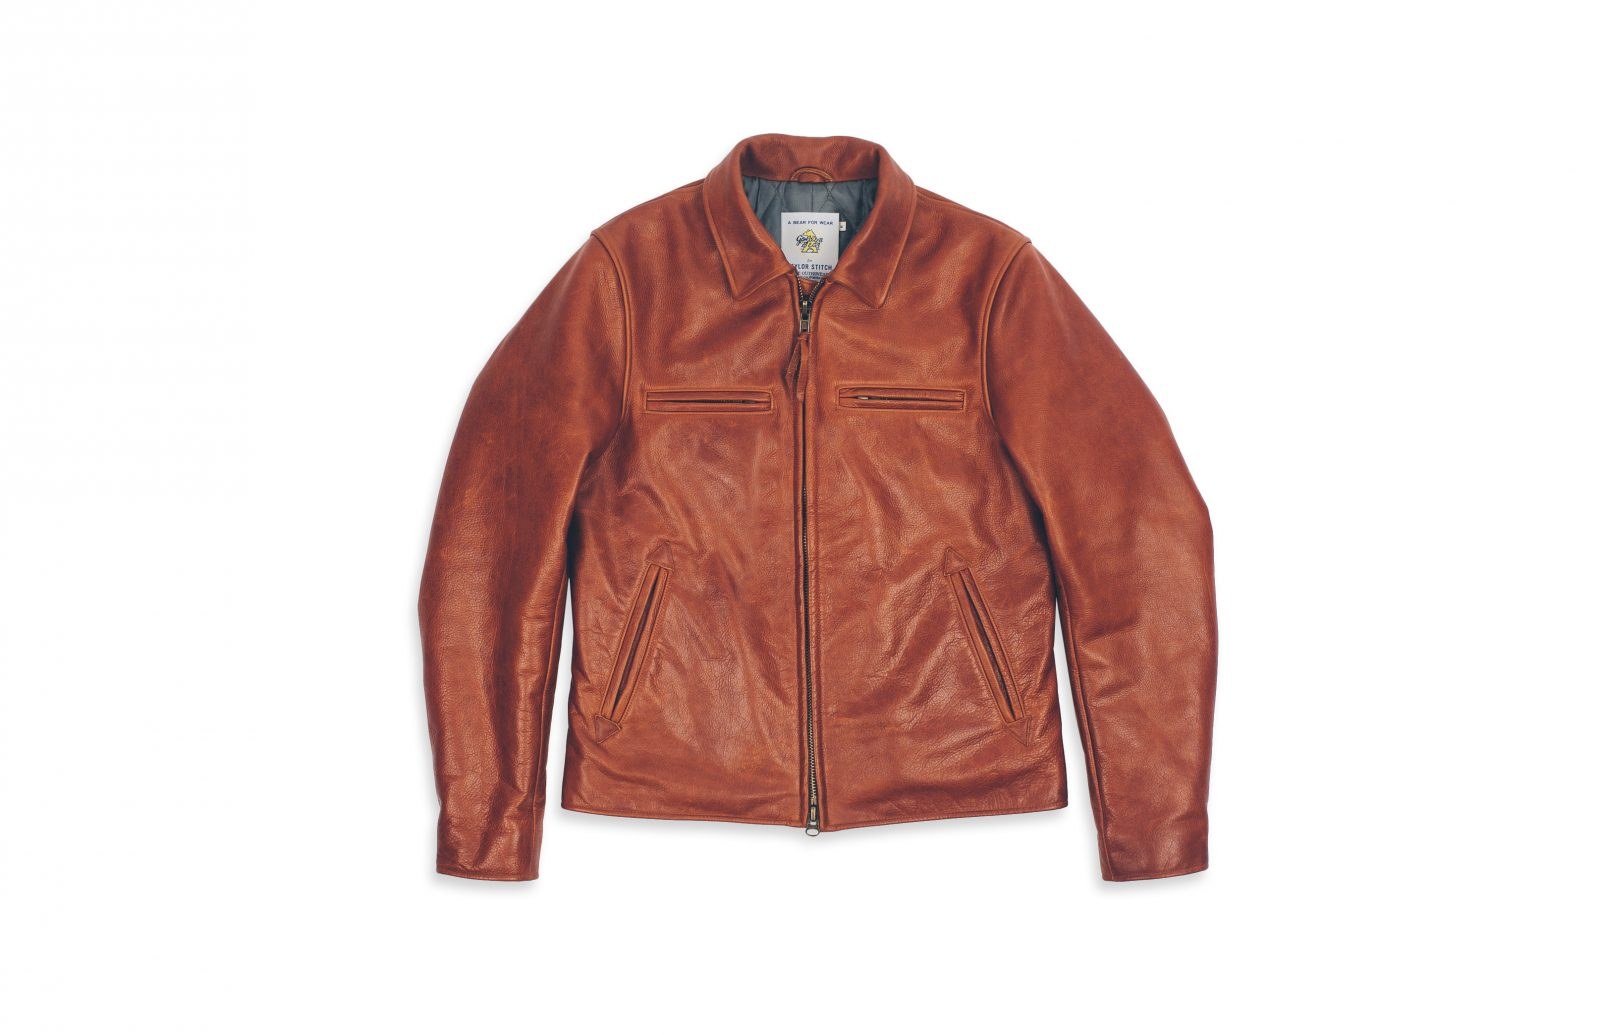 Taylor Stitch Whiskey Steerhide Moto Jacket 1600x1035 - Taylor Stitch x Golden Bear Whiskey Steerhide Jacket